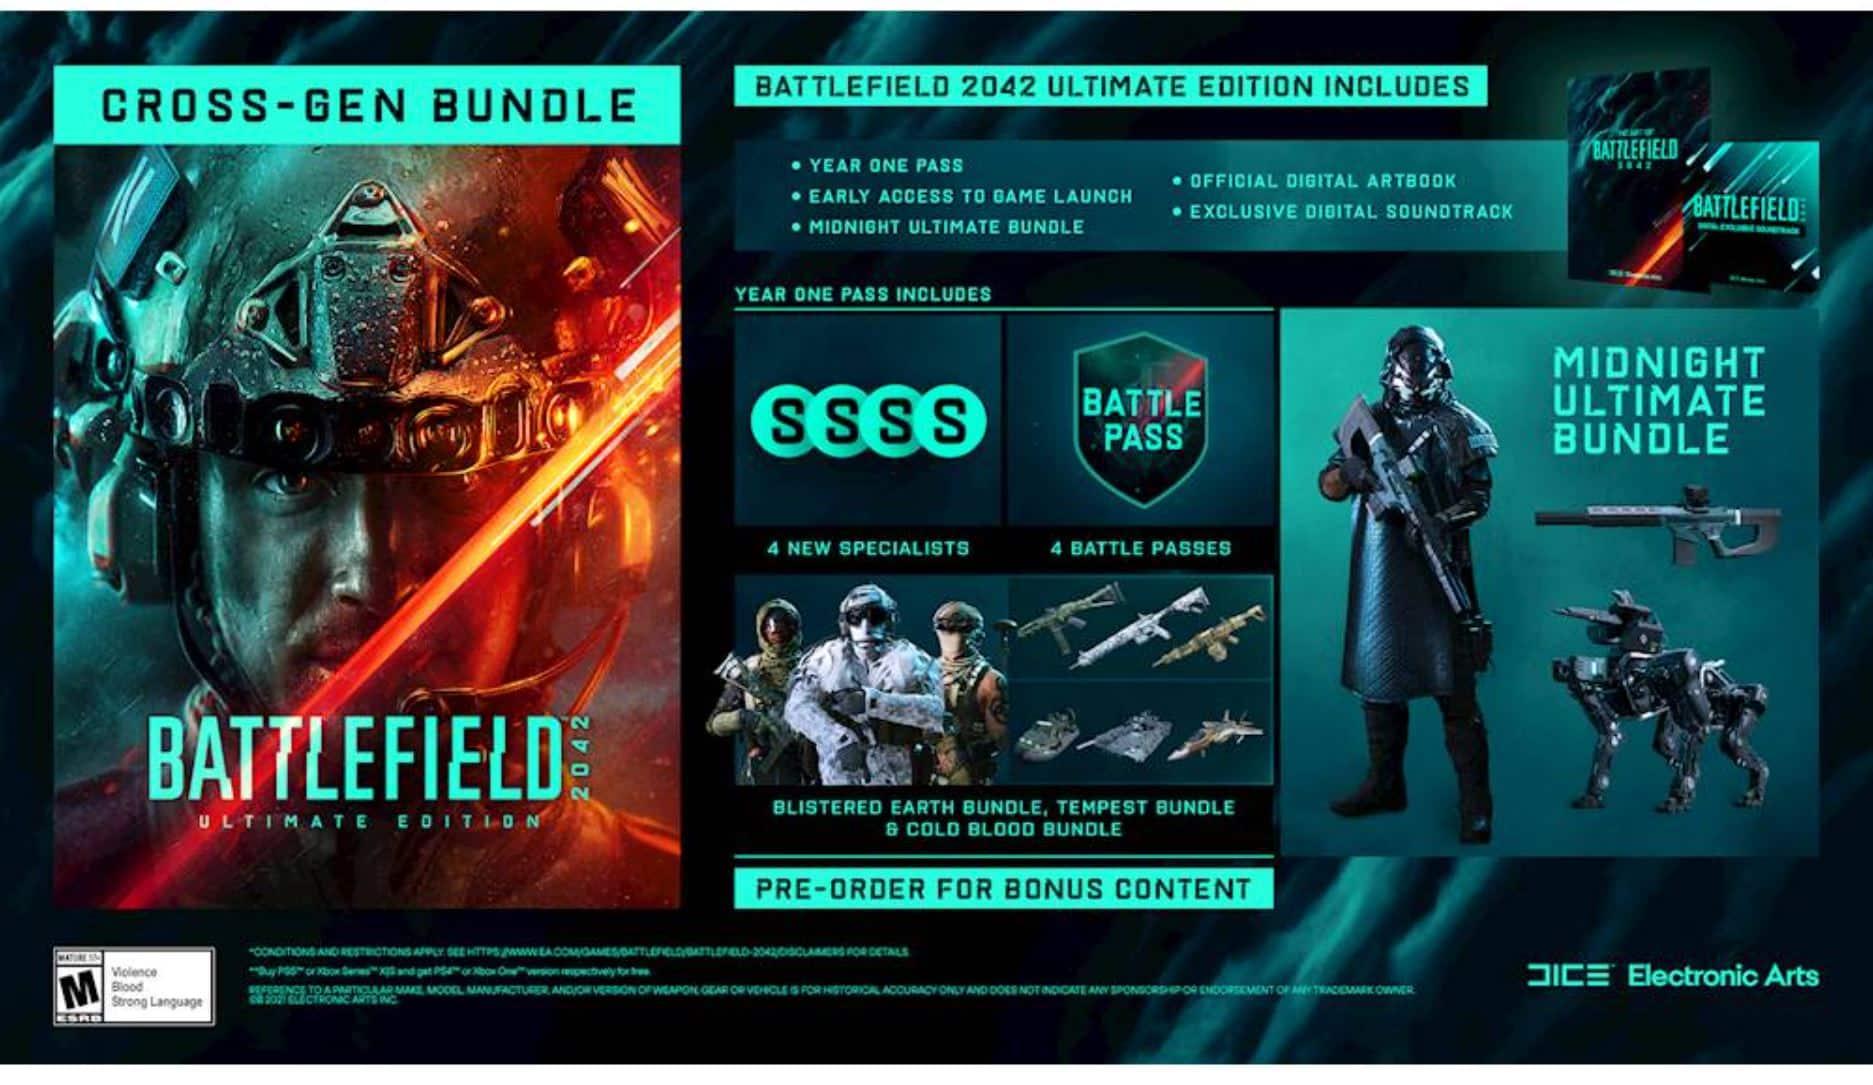 battlefield-2042-ultimate-edition-danach